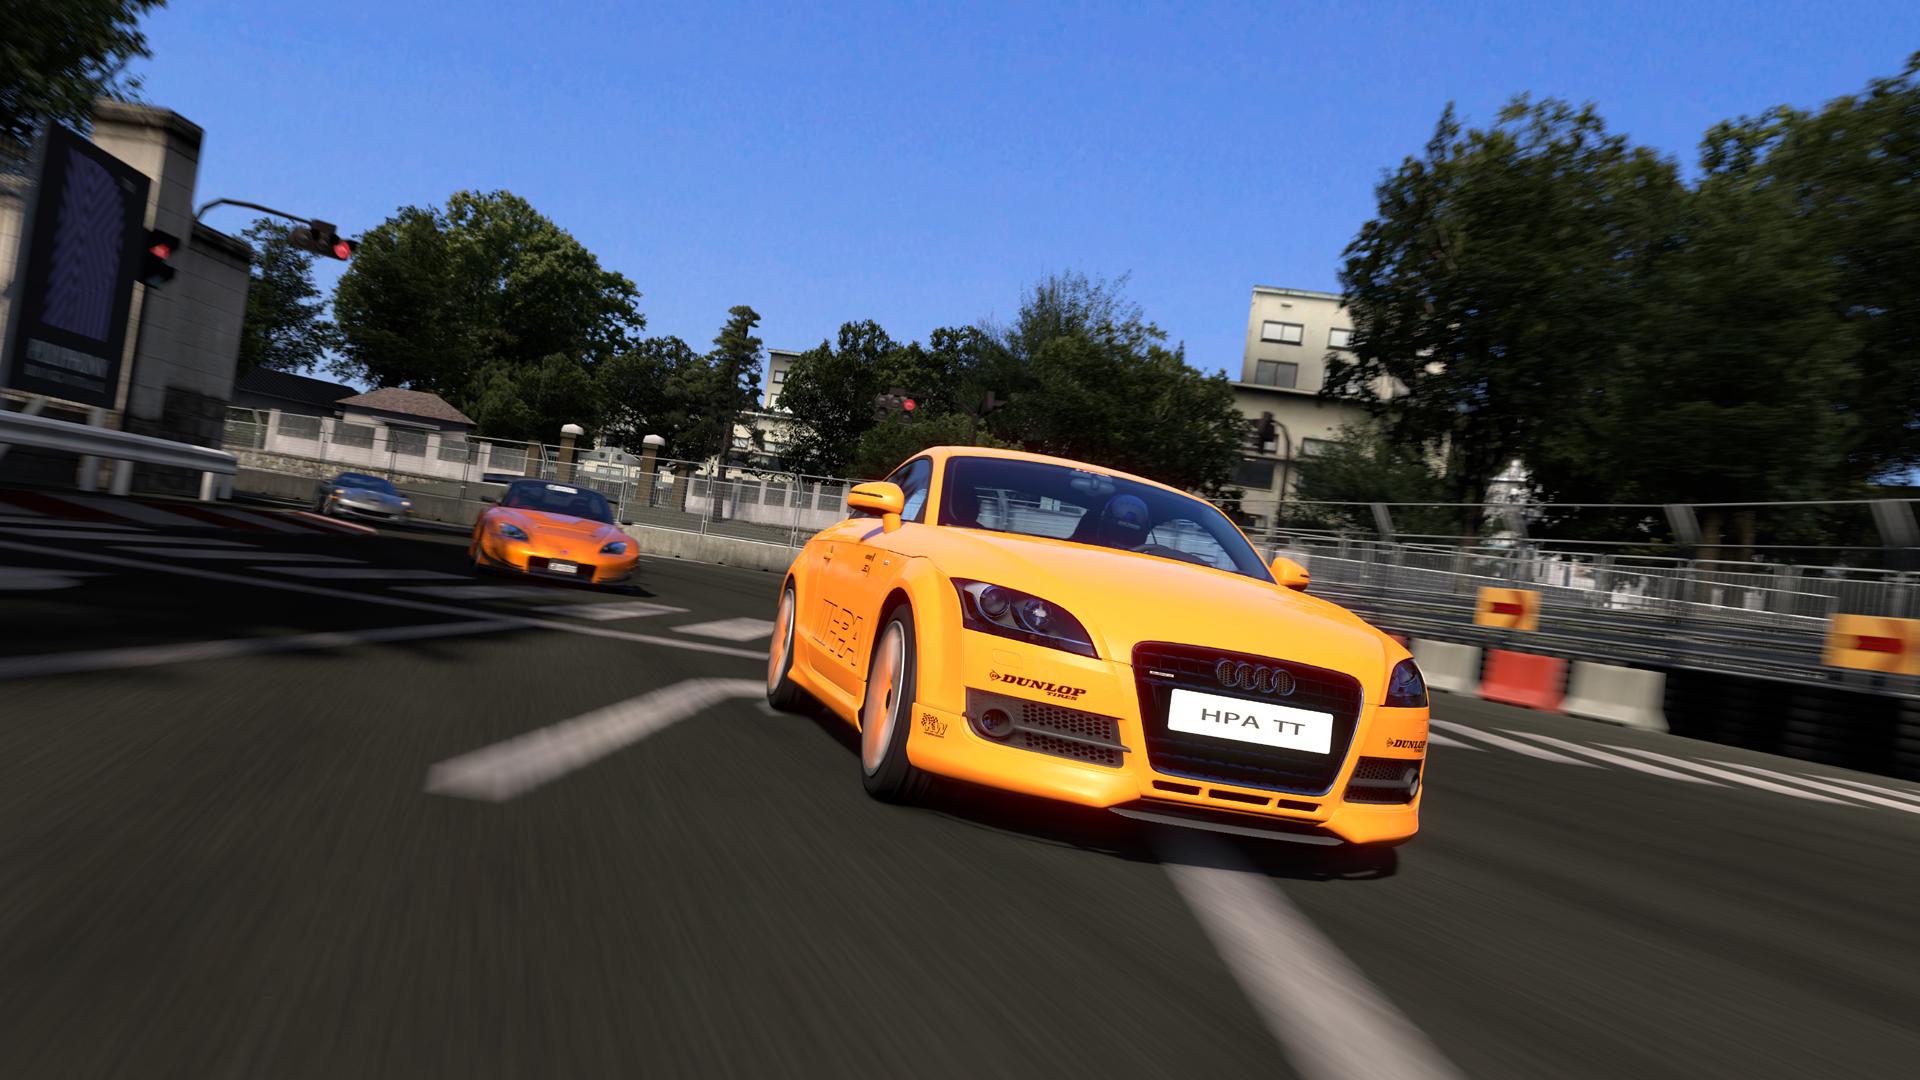 gran turismo 5 sema cars screenshots sim racing news. Black Bedroom Furniture Sets. Home Design Ideas